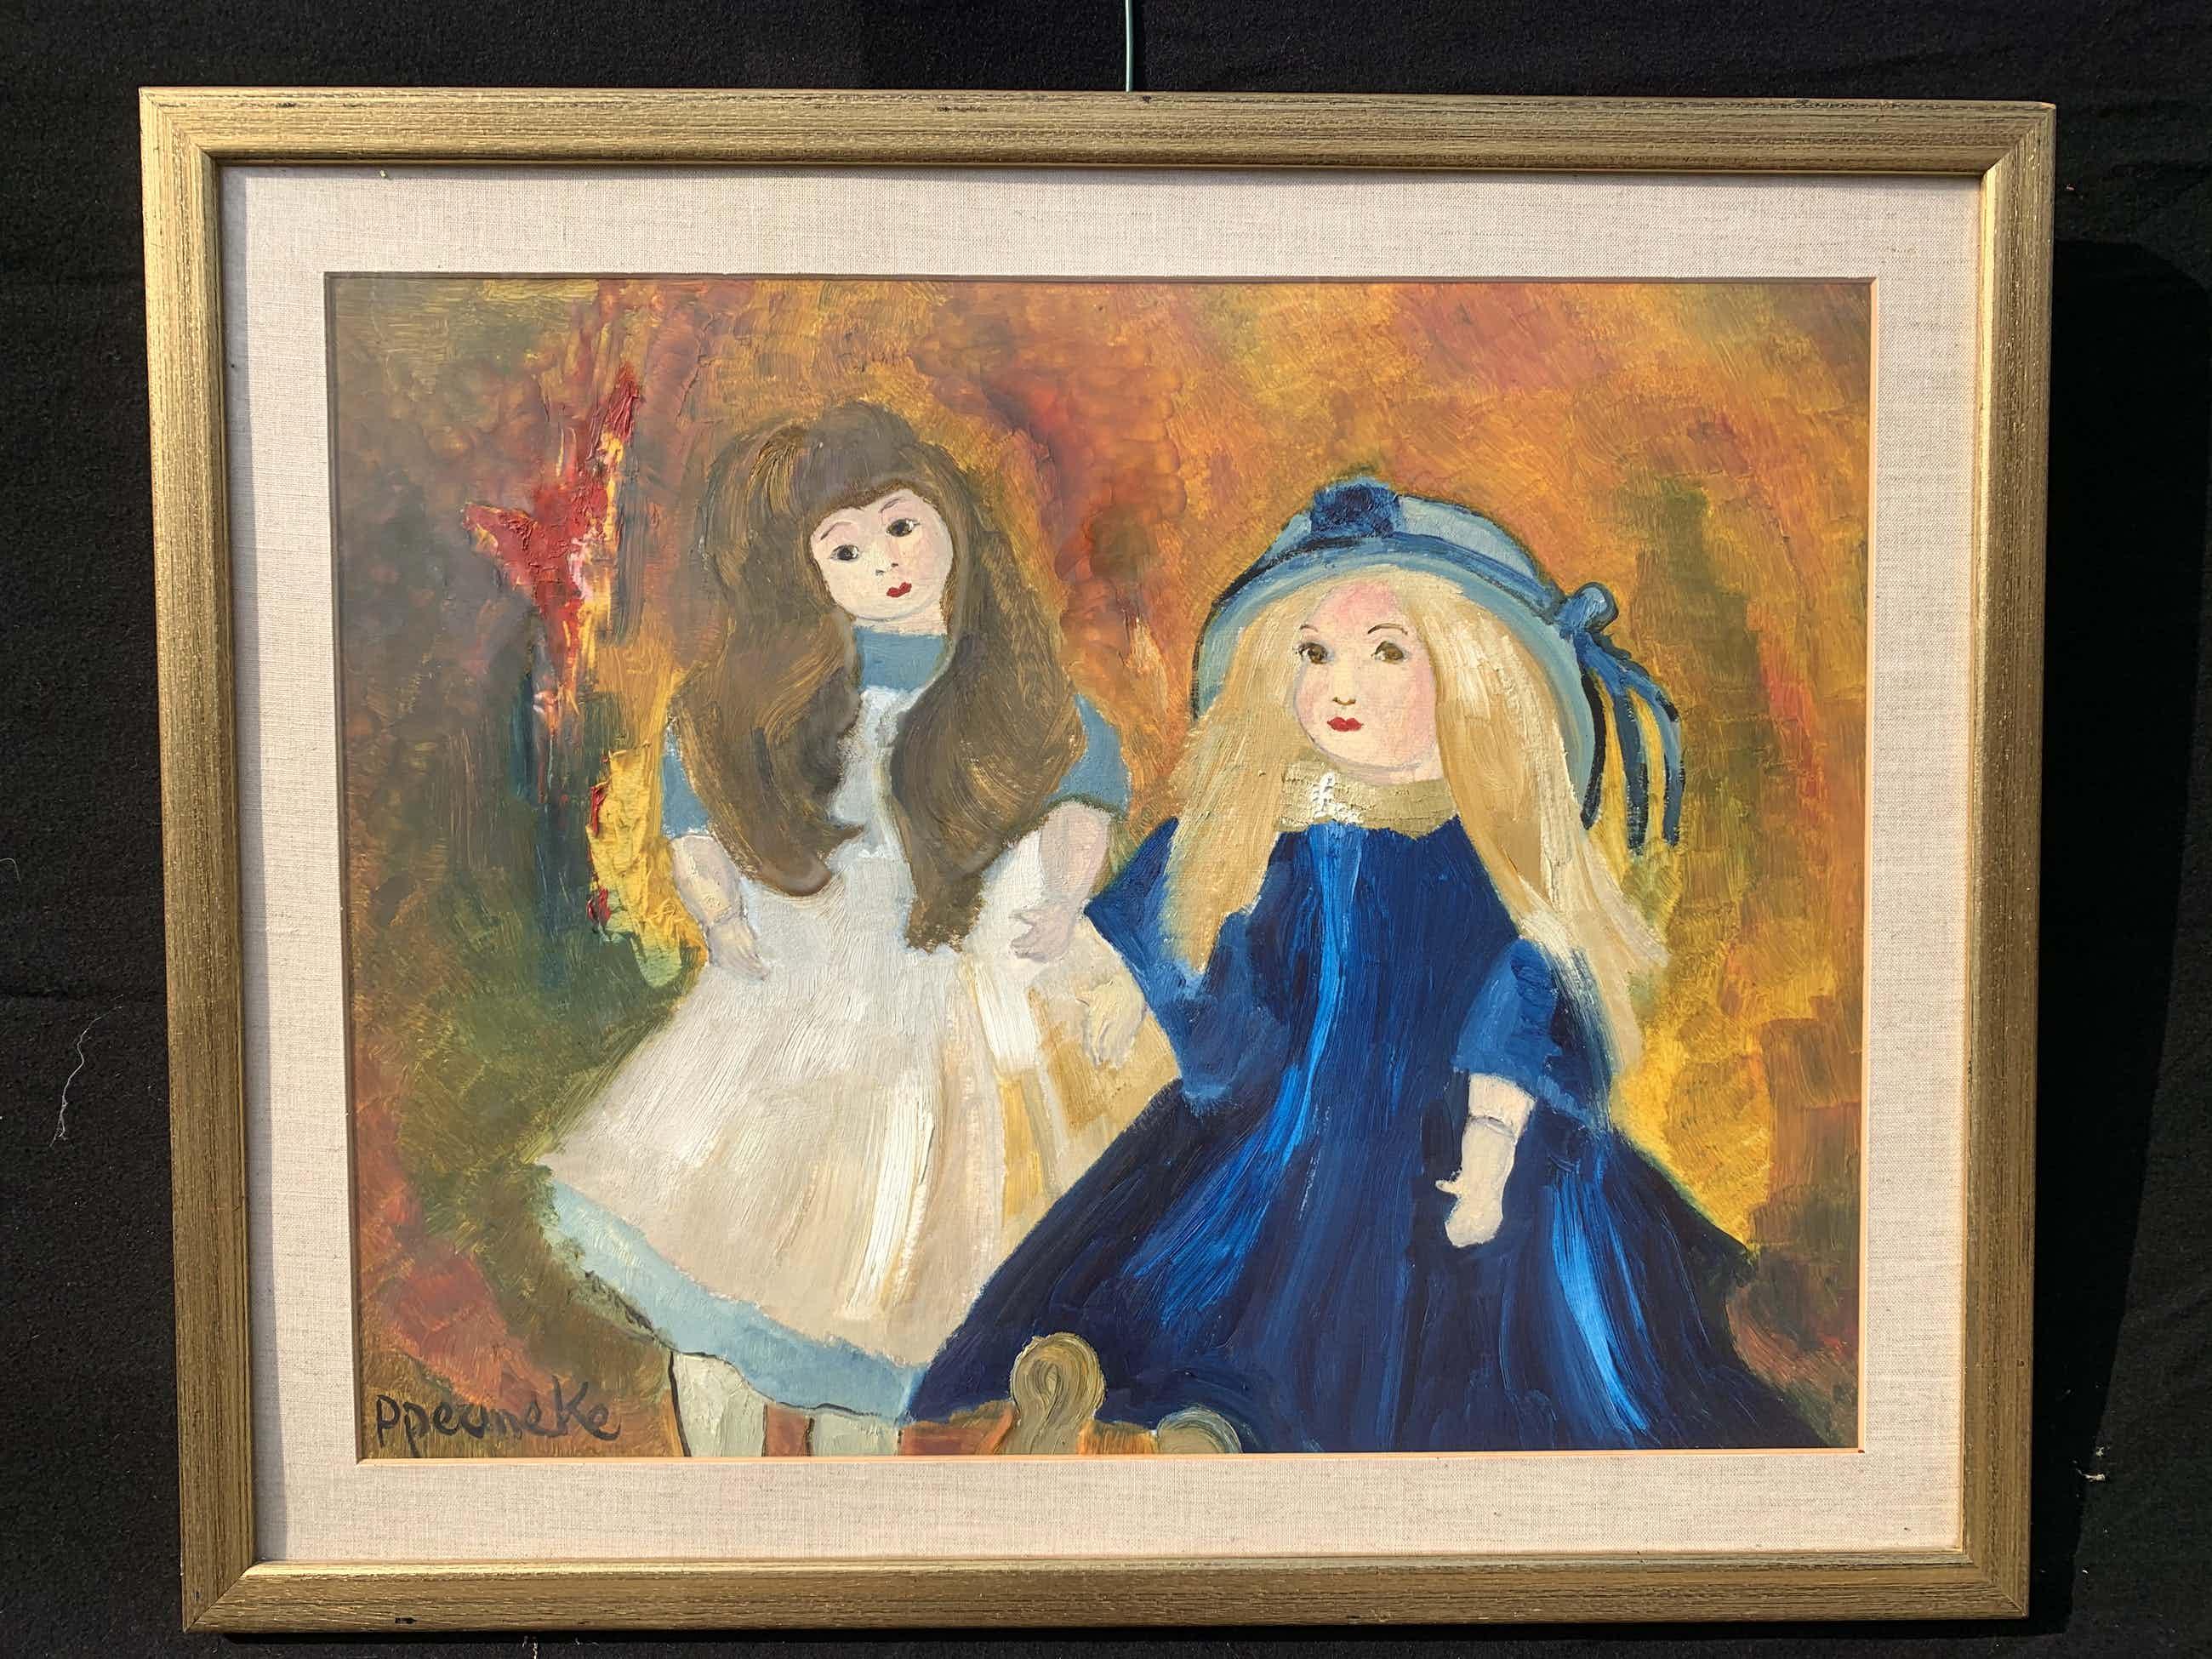 Paul Permeke - Olieverf schilderij: twee meisjes. kopen? Bied vanaf 370!